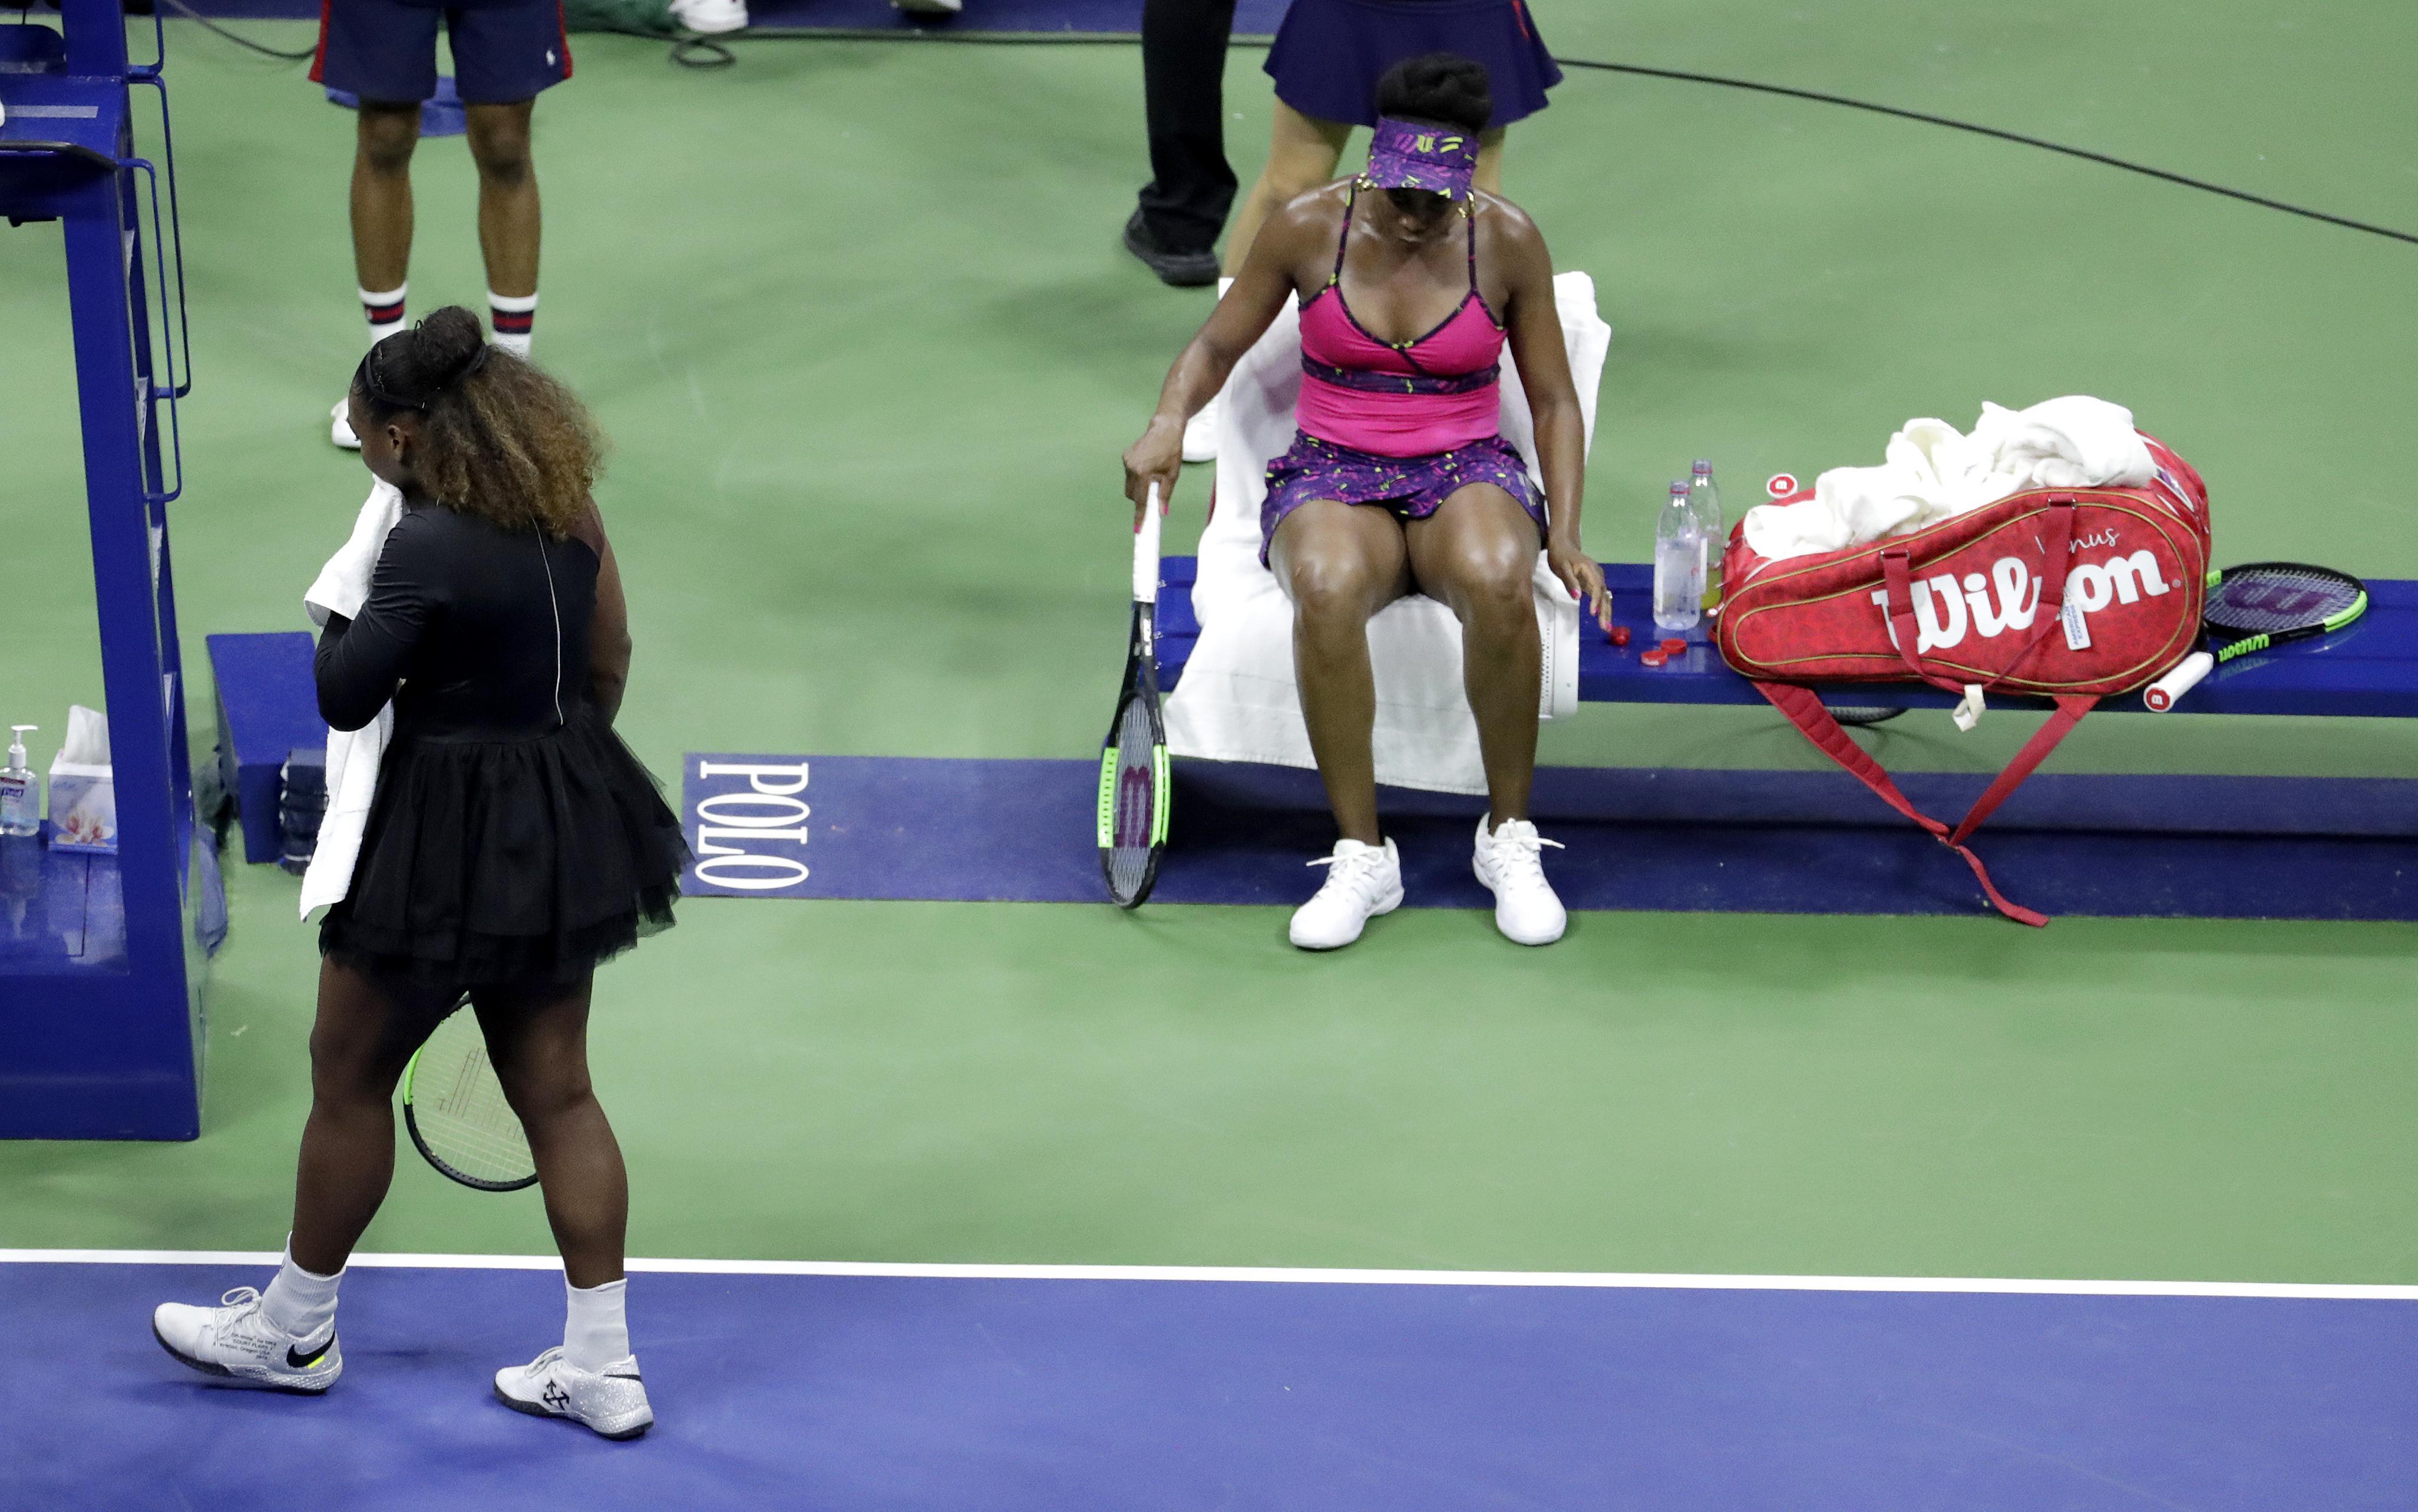 The 6-1 6-2 win was Venus' most dominant over Serena